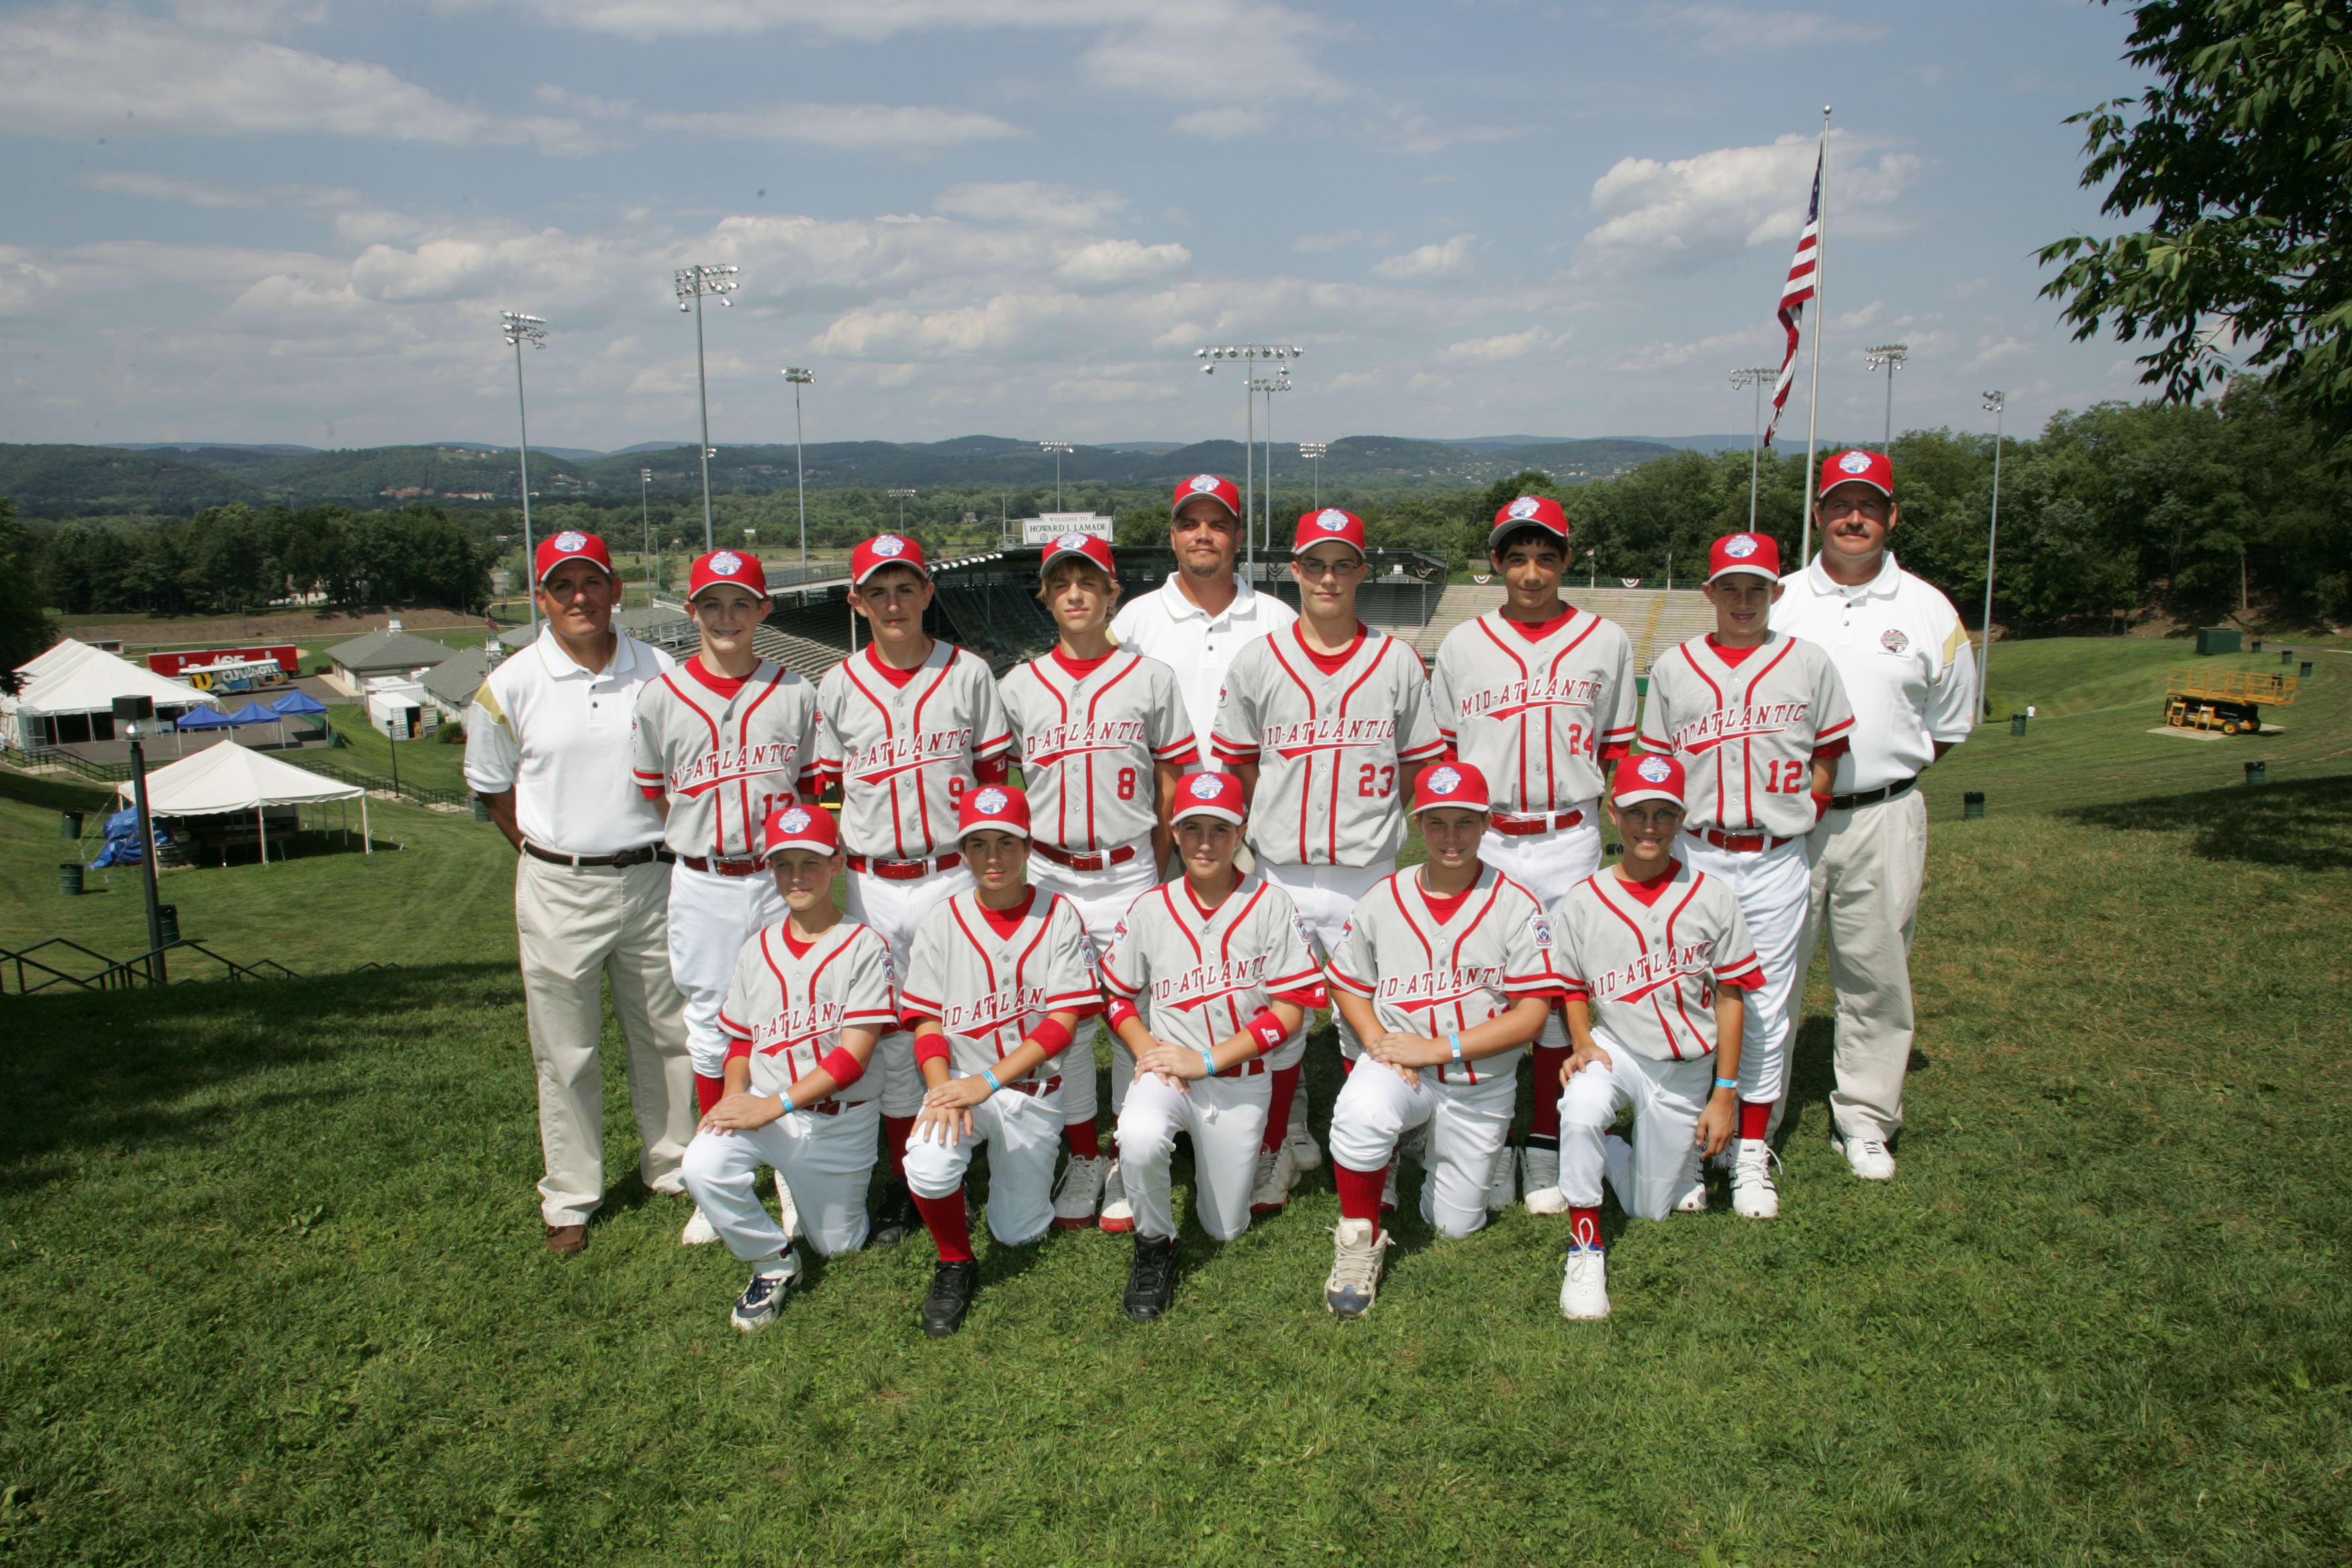 2005 Mid-Atlantic Team Photo